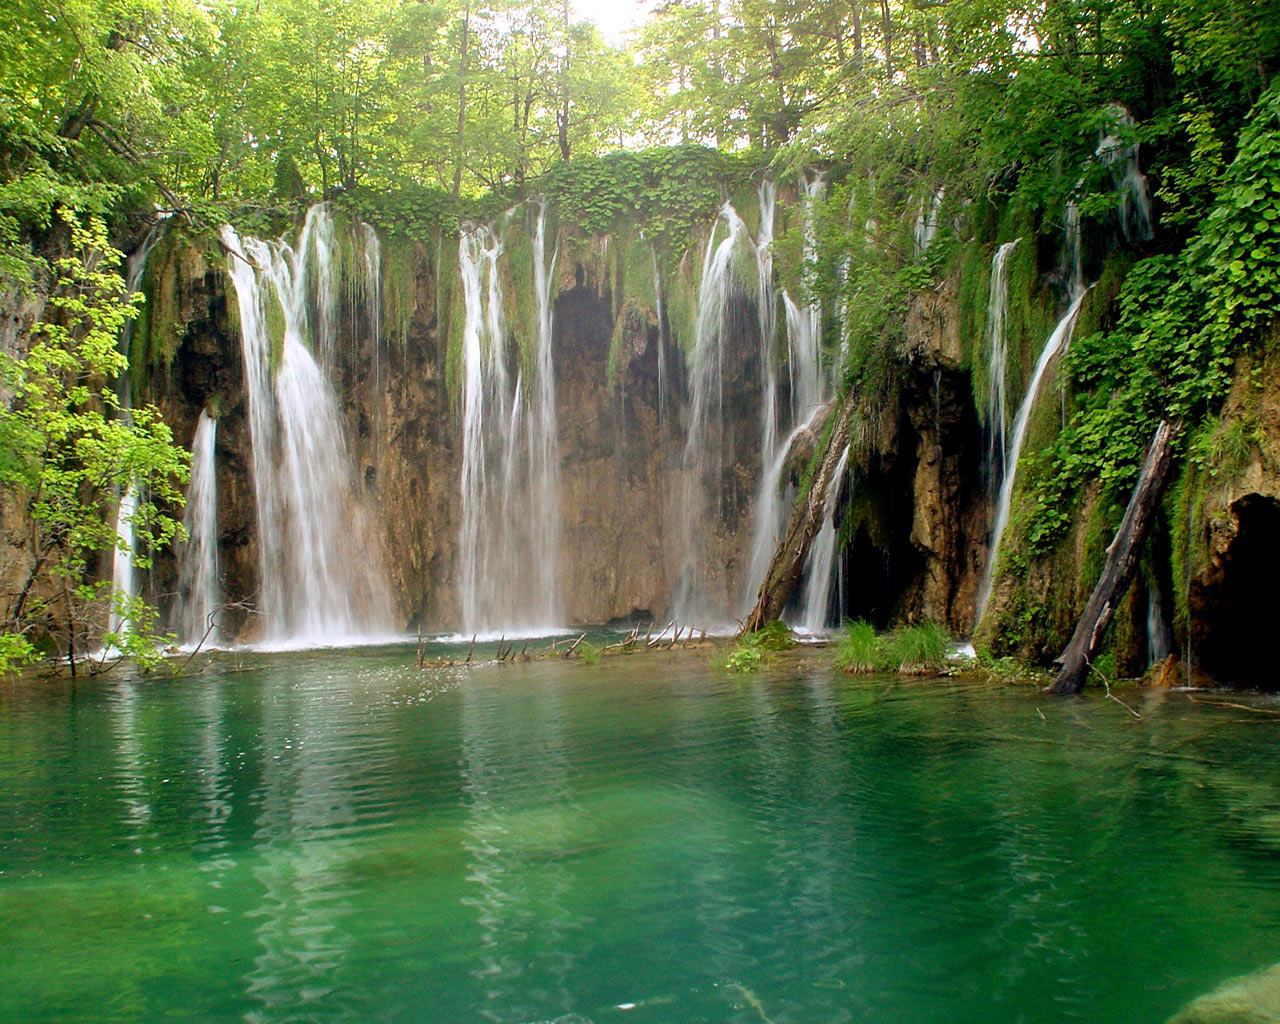 Waterfall Wallpapers   Best Waterfall Wallpapers 1280x1024